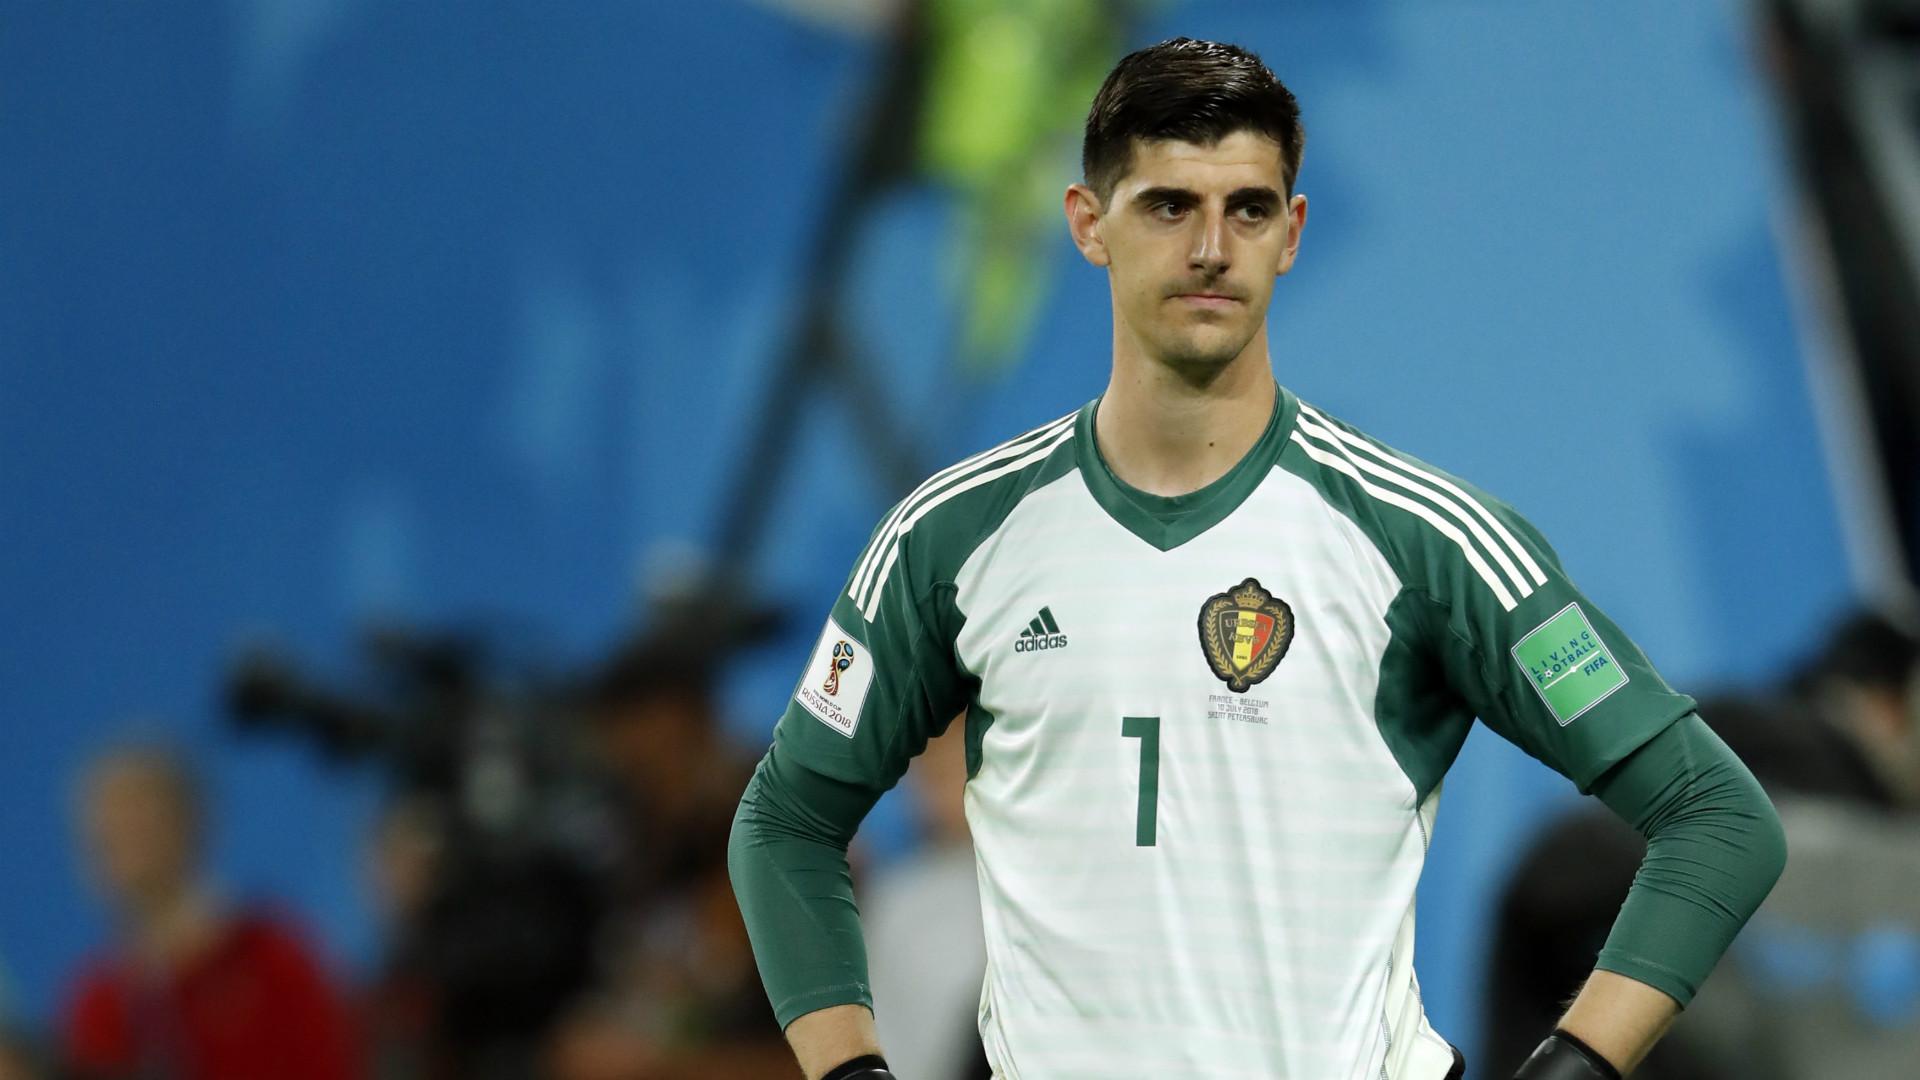 France Belgium World Cup 2018 Thibaut Courtois